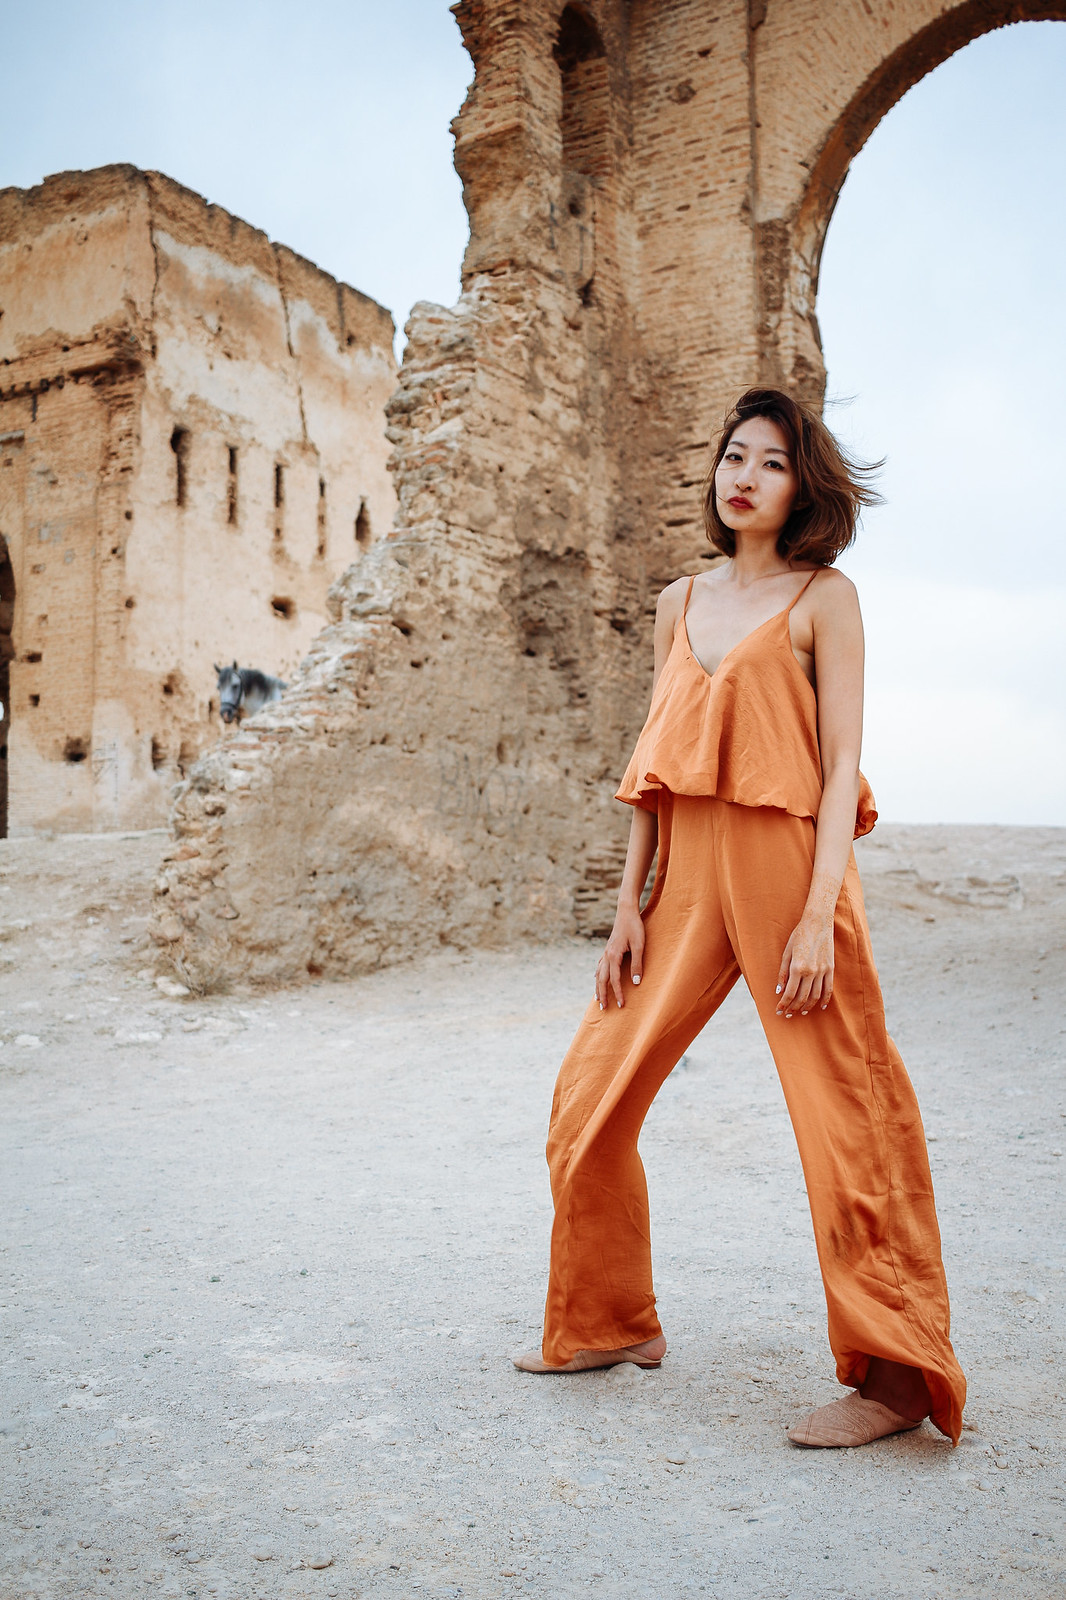 Fes Morocco - kisses,vera-67